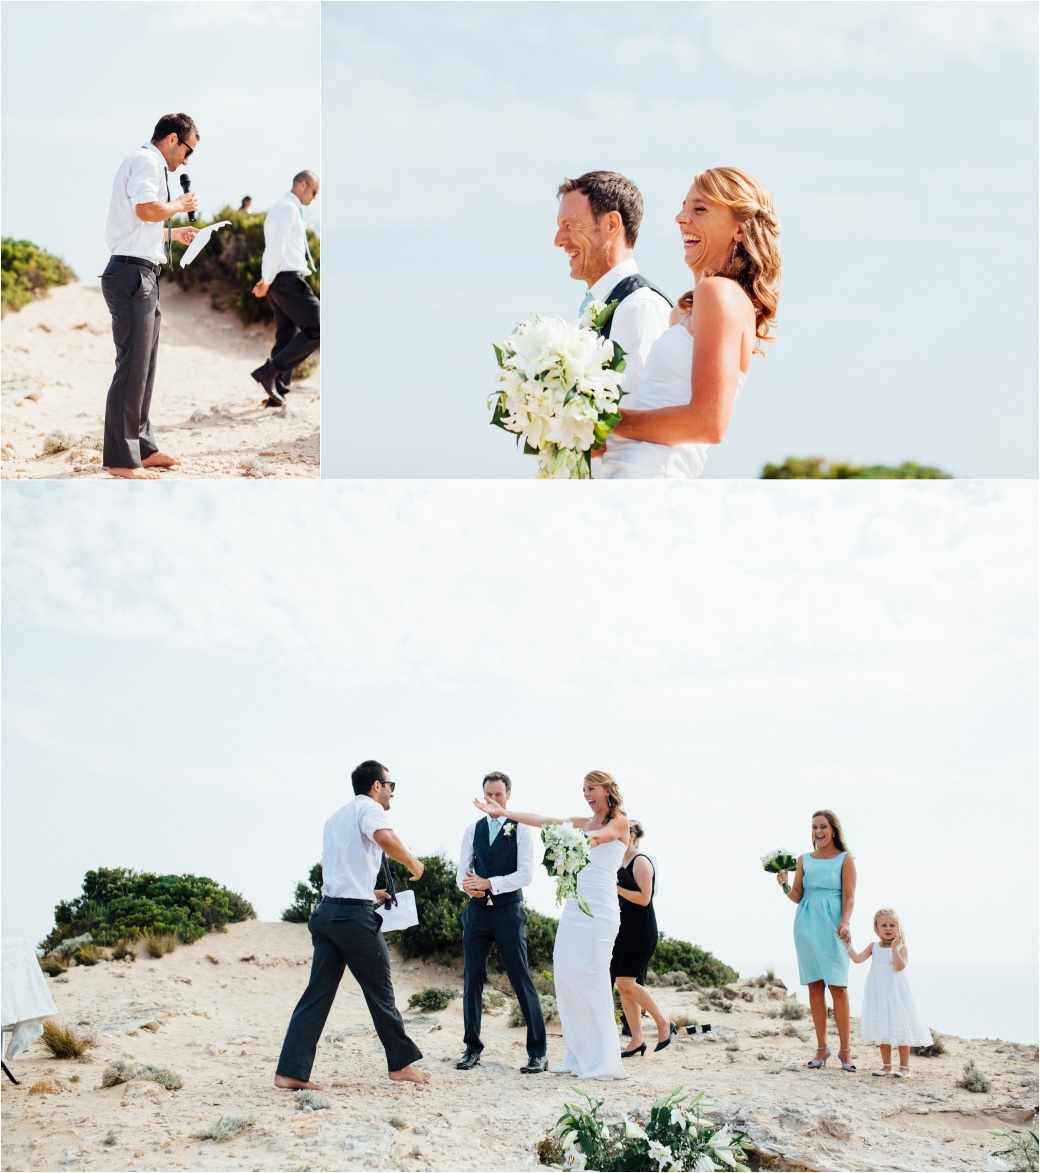 hanwin triathlon taco truck sorrento australian beach witsup wedding day melbourne wedding hyggelig photography039